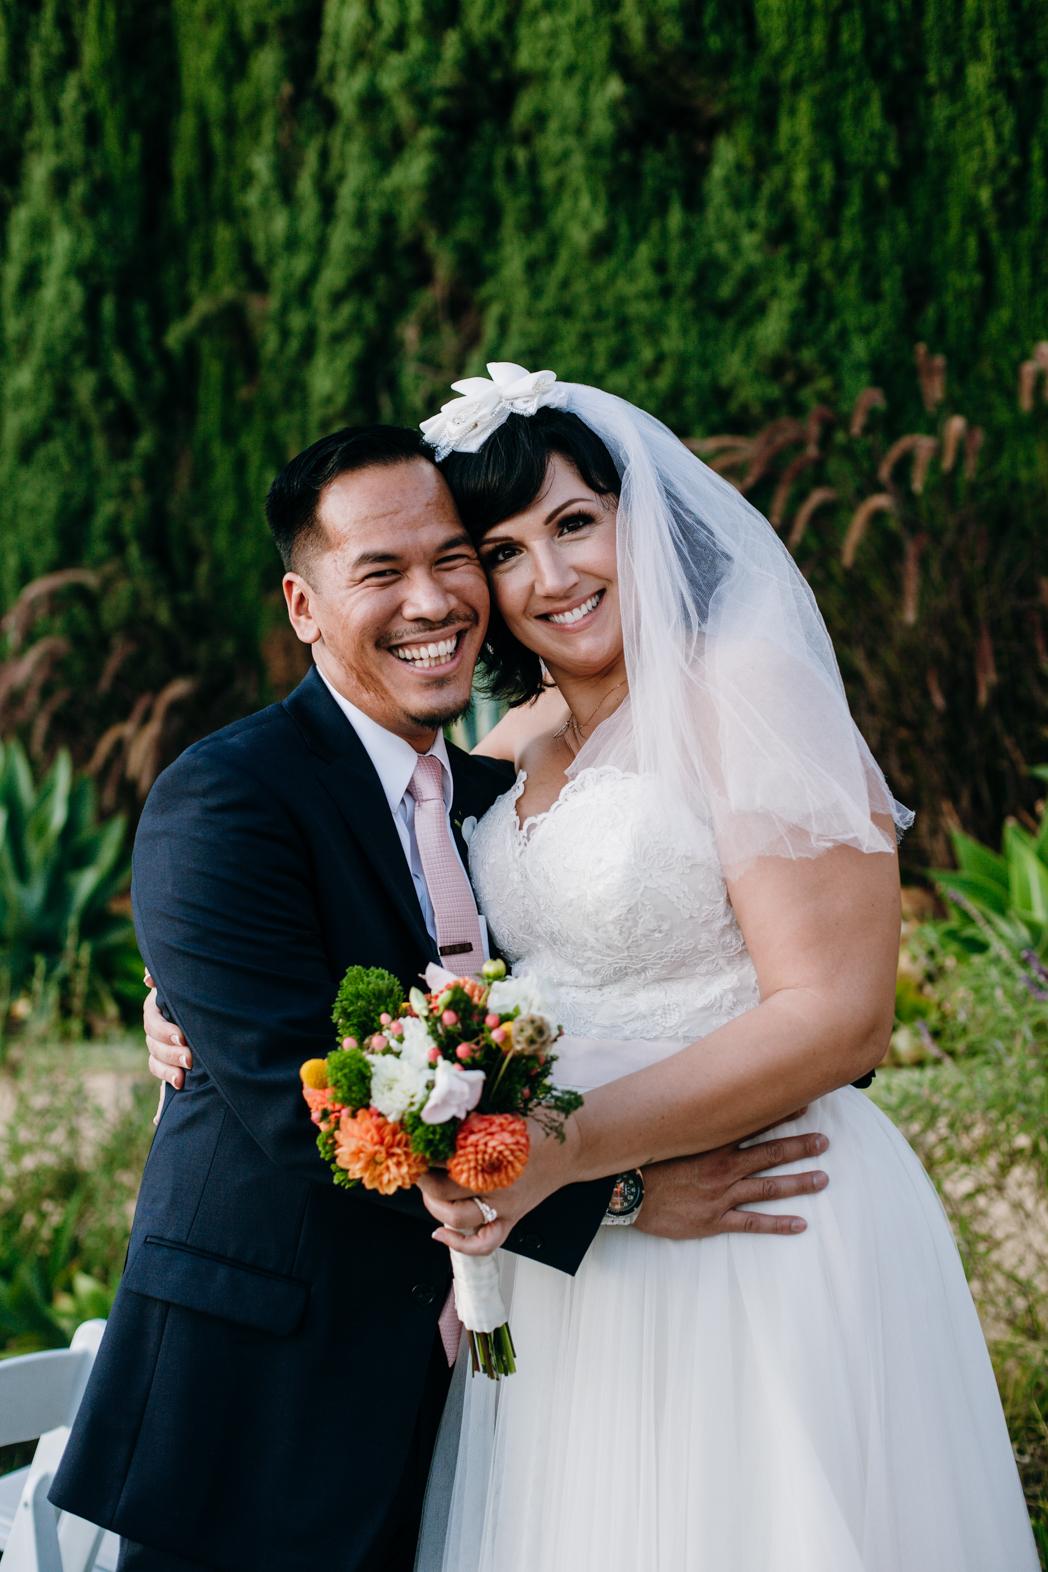 KaraNixonWeddings-LosAngeles-Wedding-26.jpg